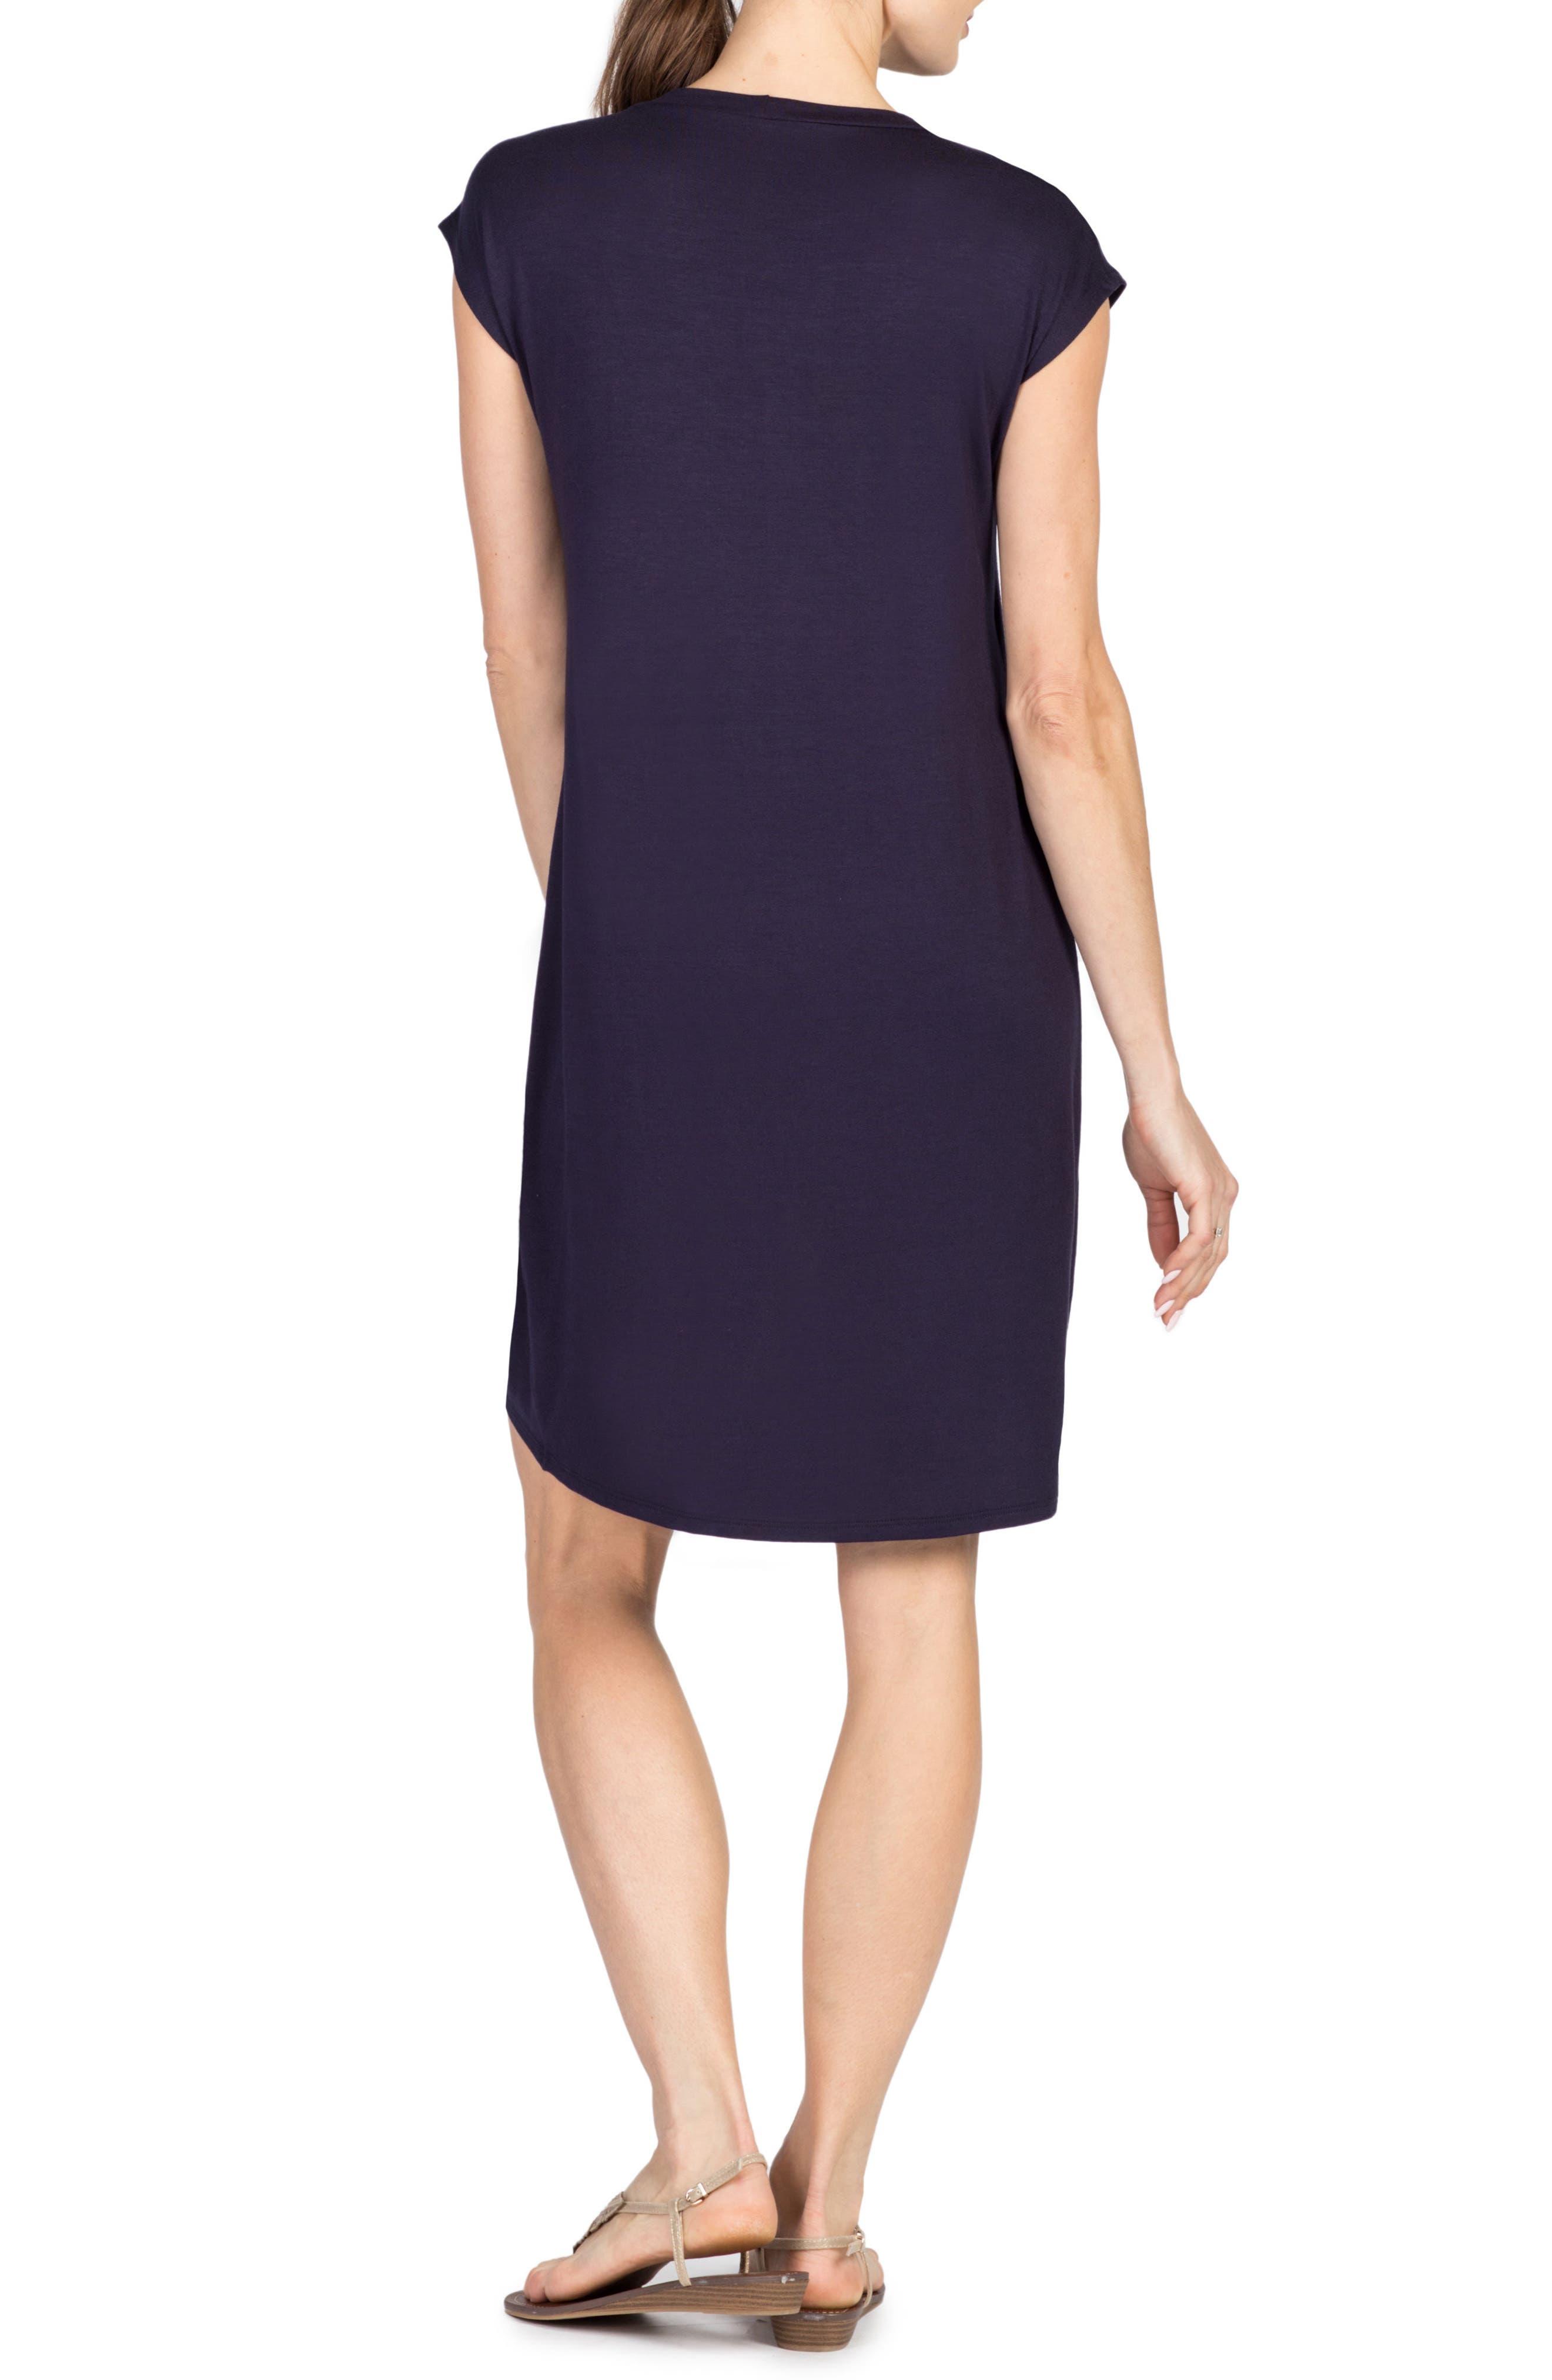 Lille Layered Maternity/Nursing Sheath Dress,                             Alternate thumbnail 2, color,                             NAVY/ WHITE STRIPE